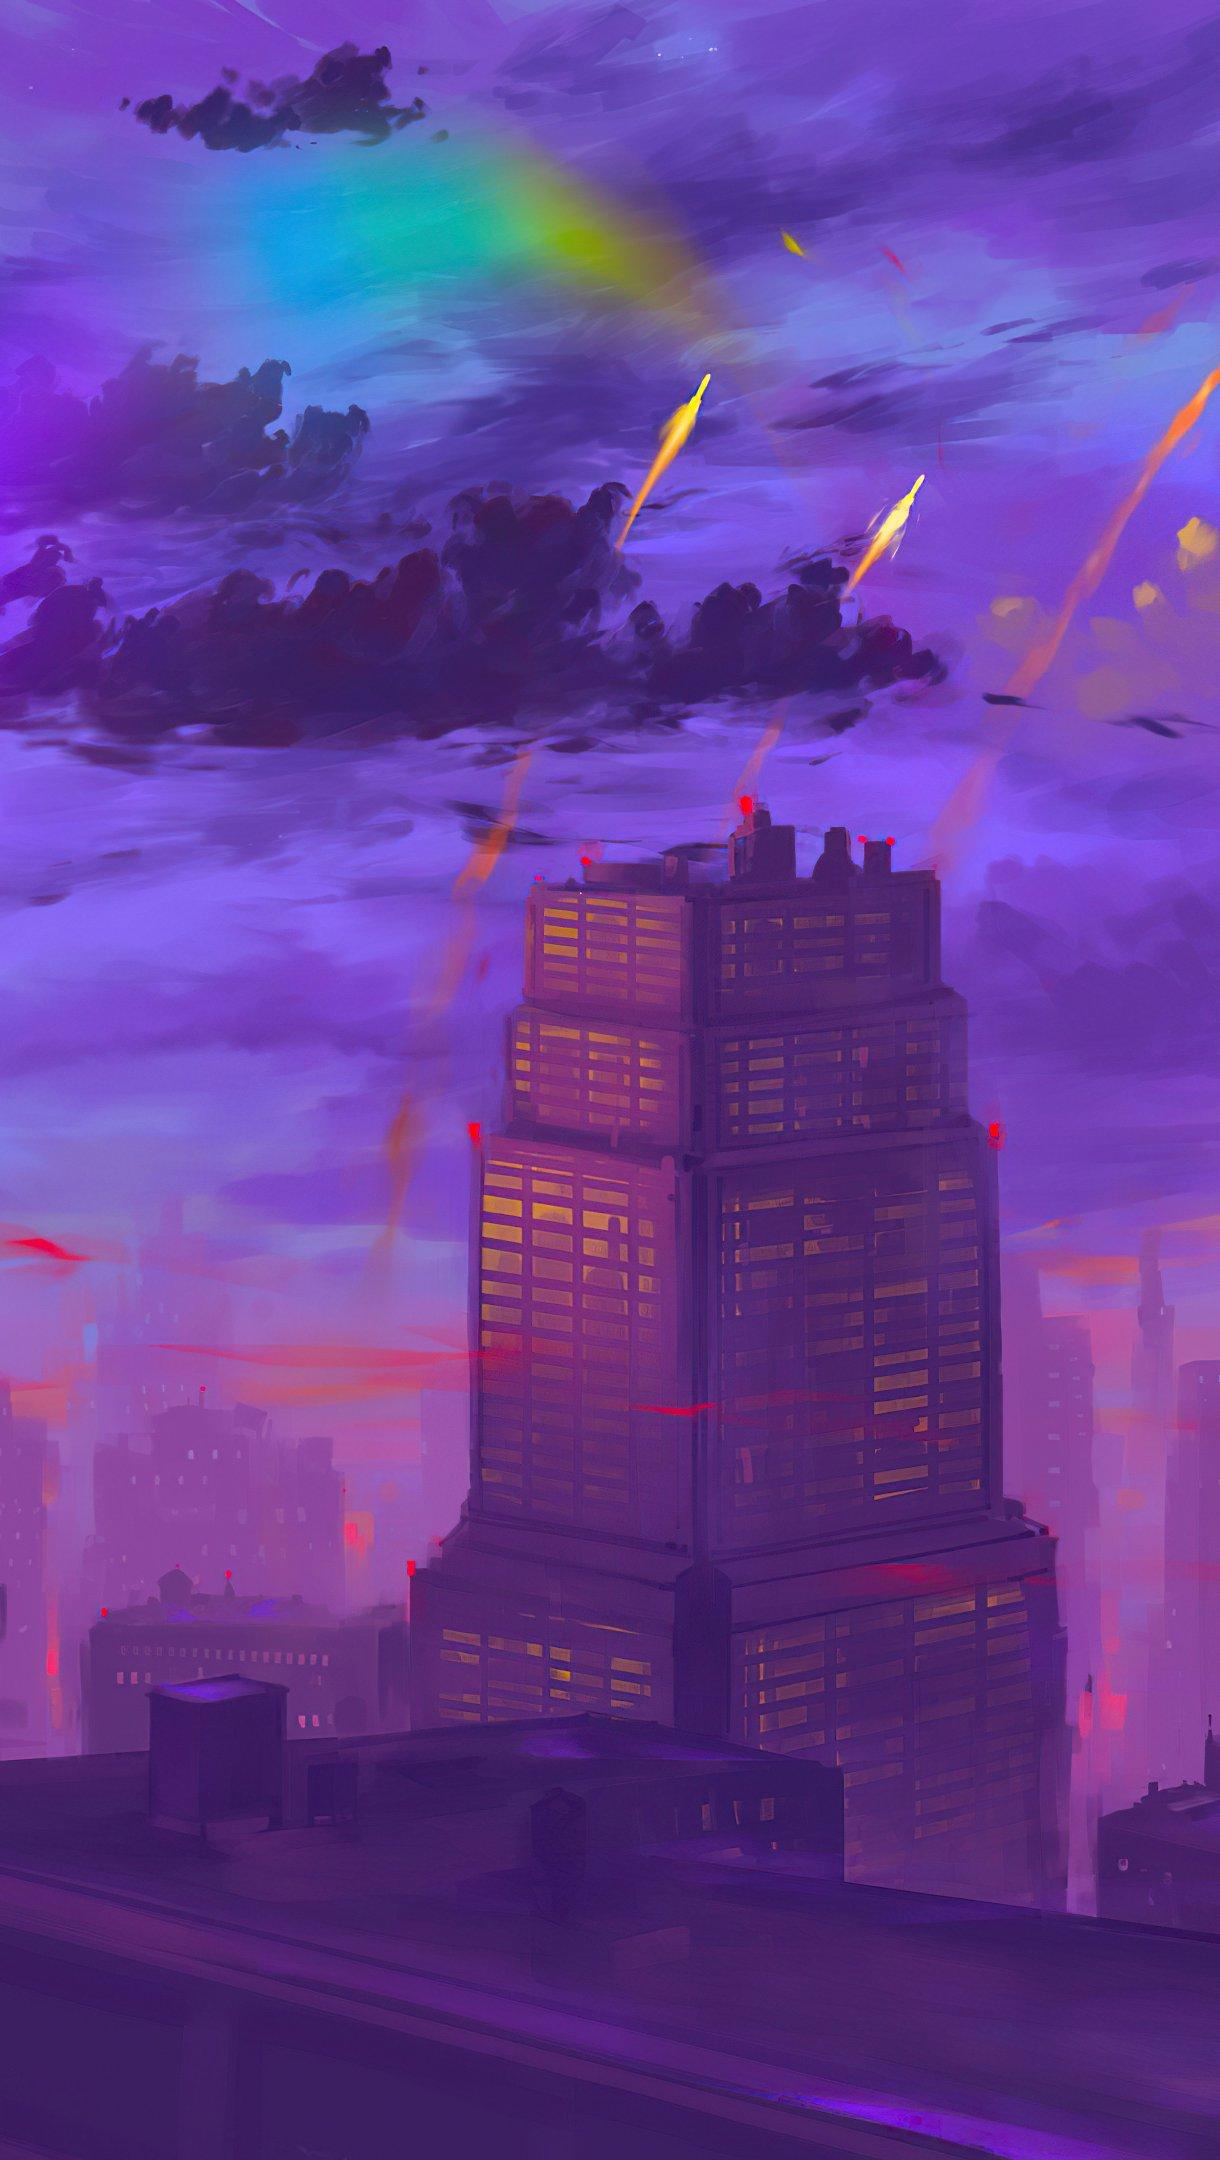 Wallpaper City Twilight Artwork Vertical